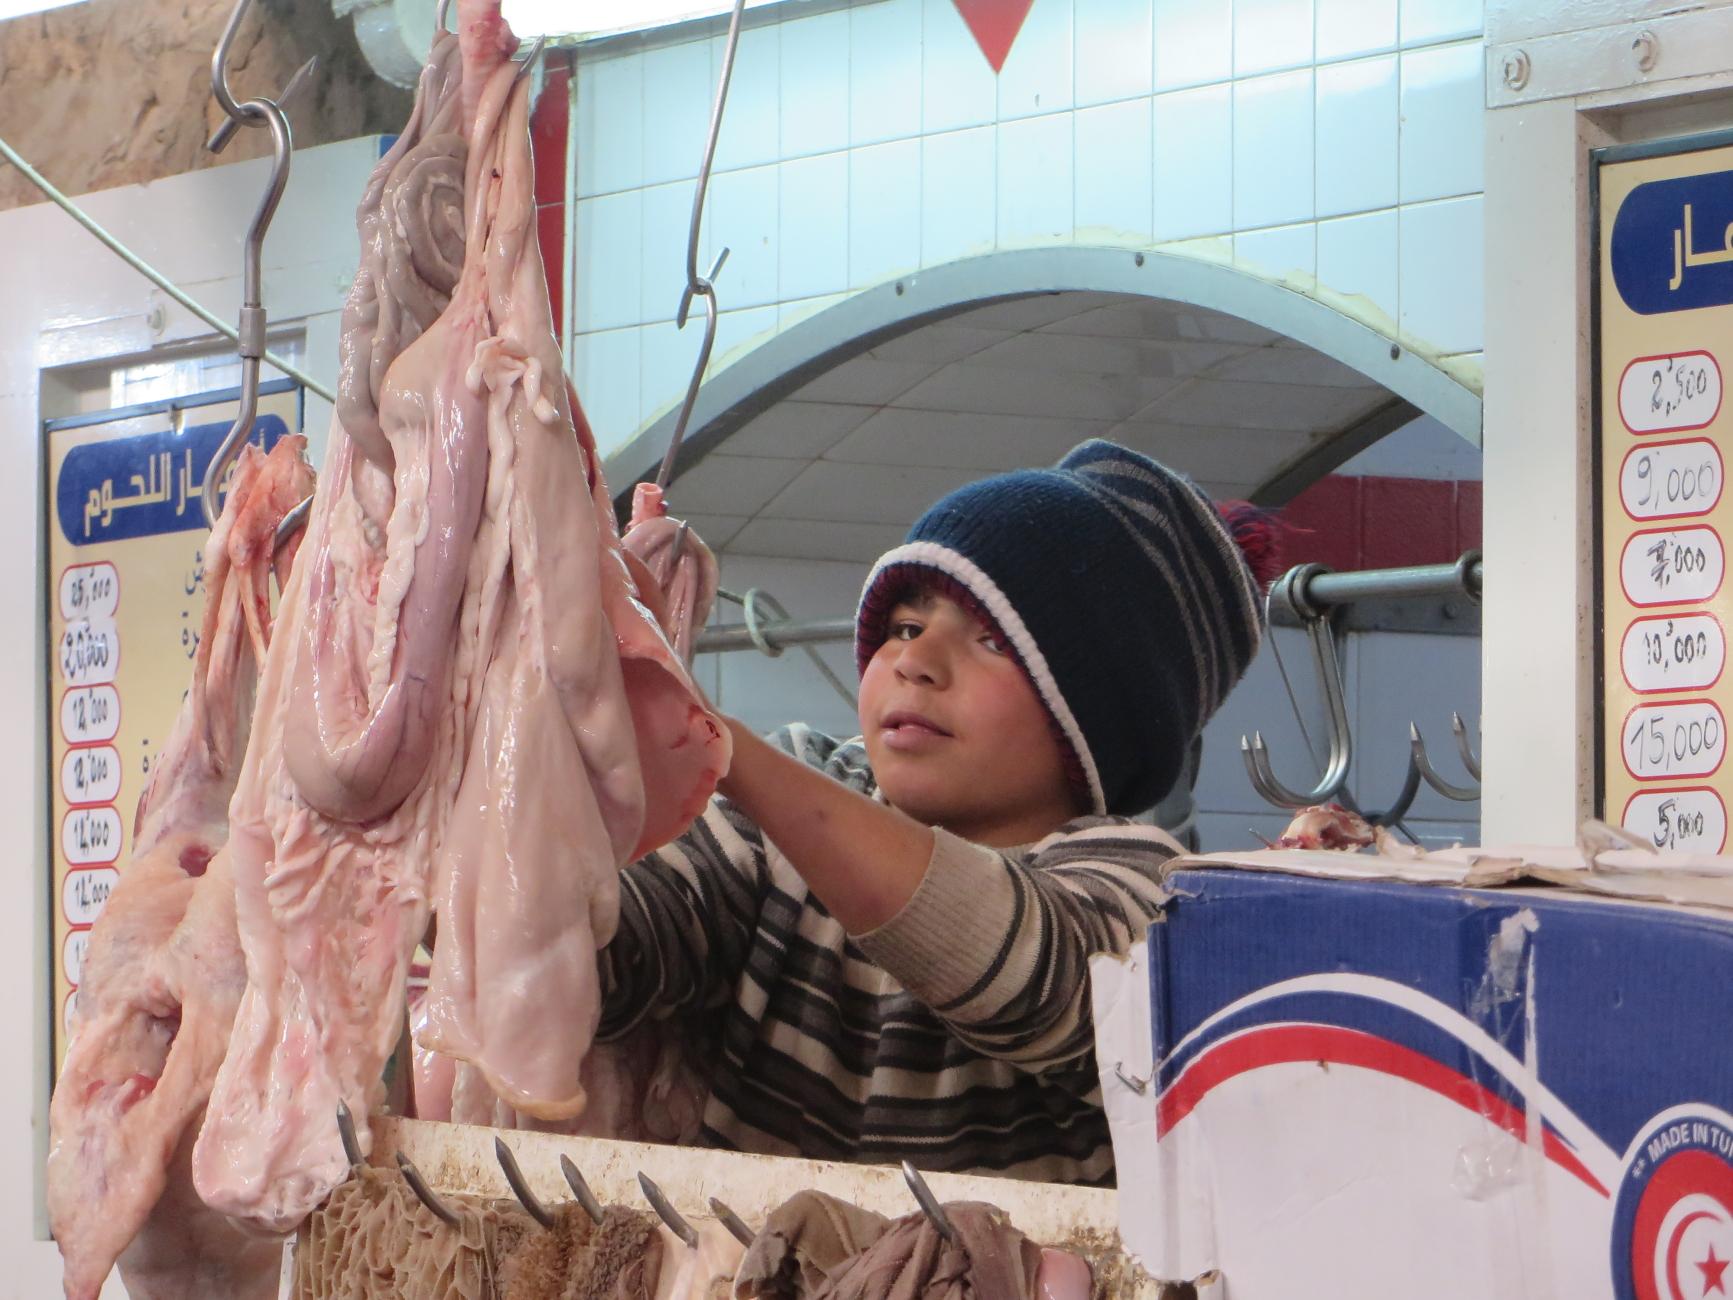 The little butcher